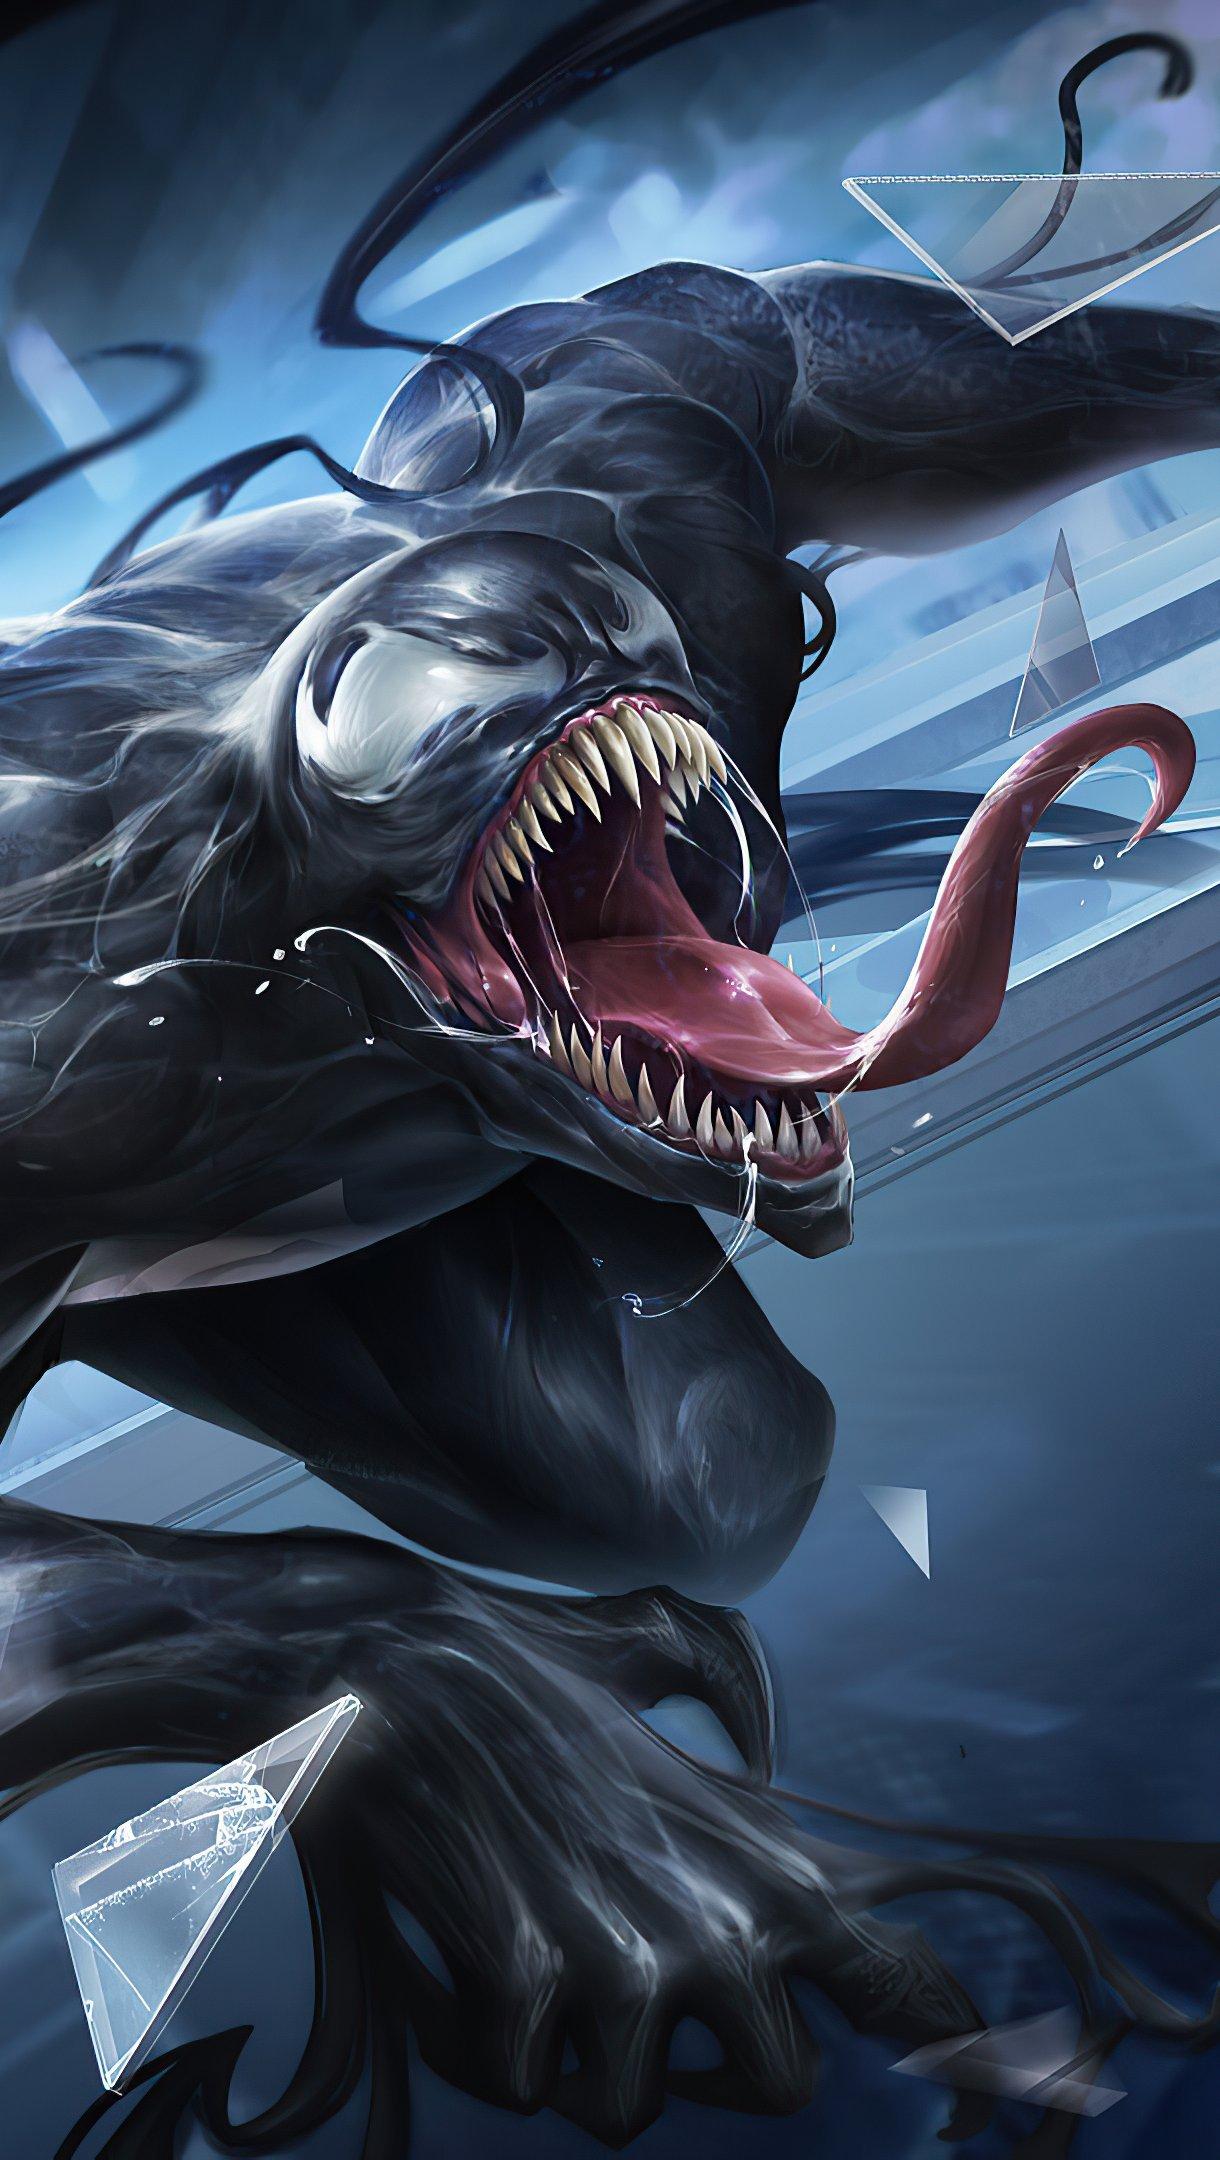 Fondos de pantalla Venom 2020 Artwork Vertical